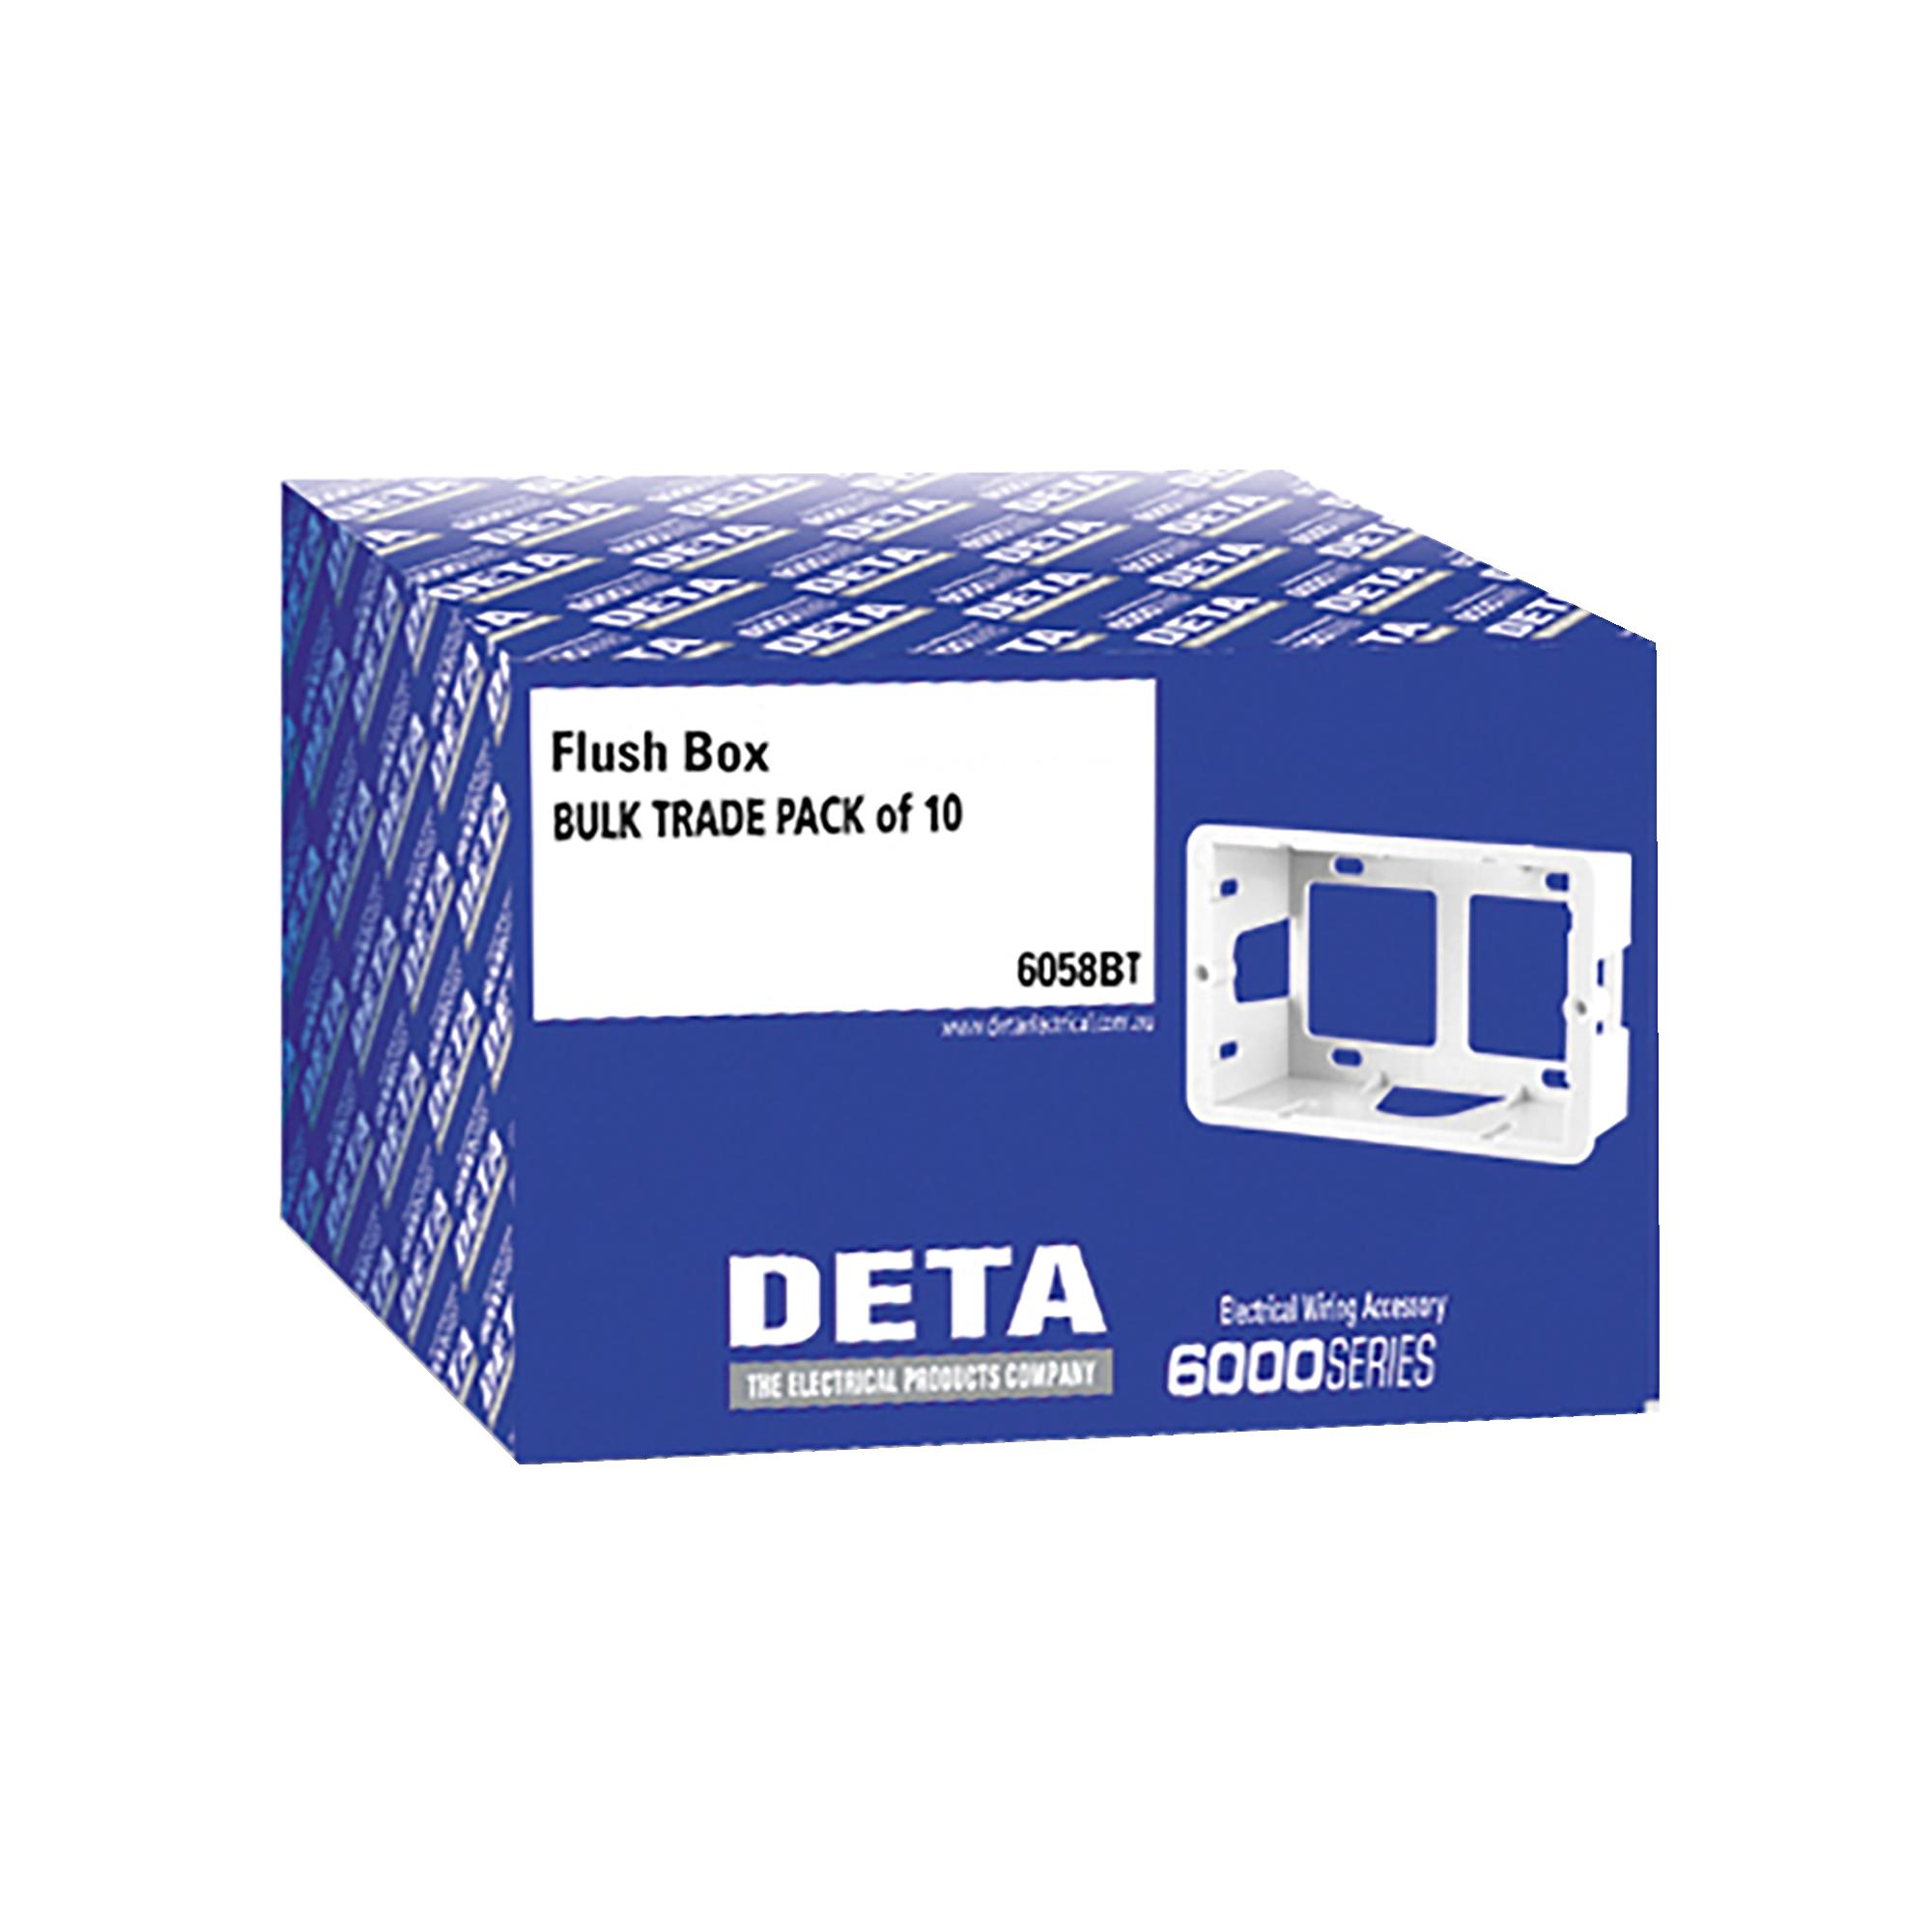 flush box - trade pack of 10